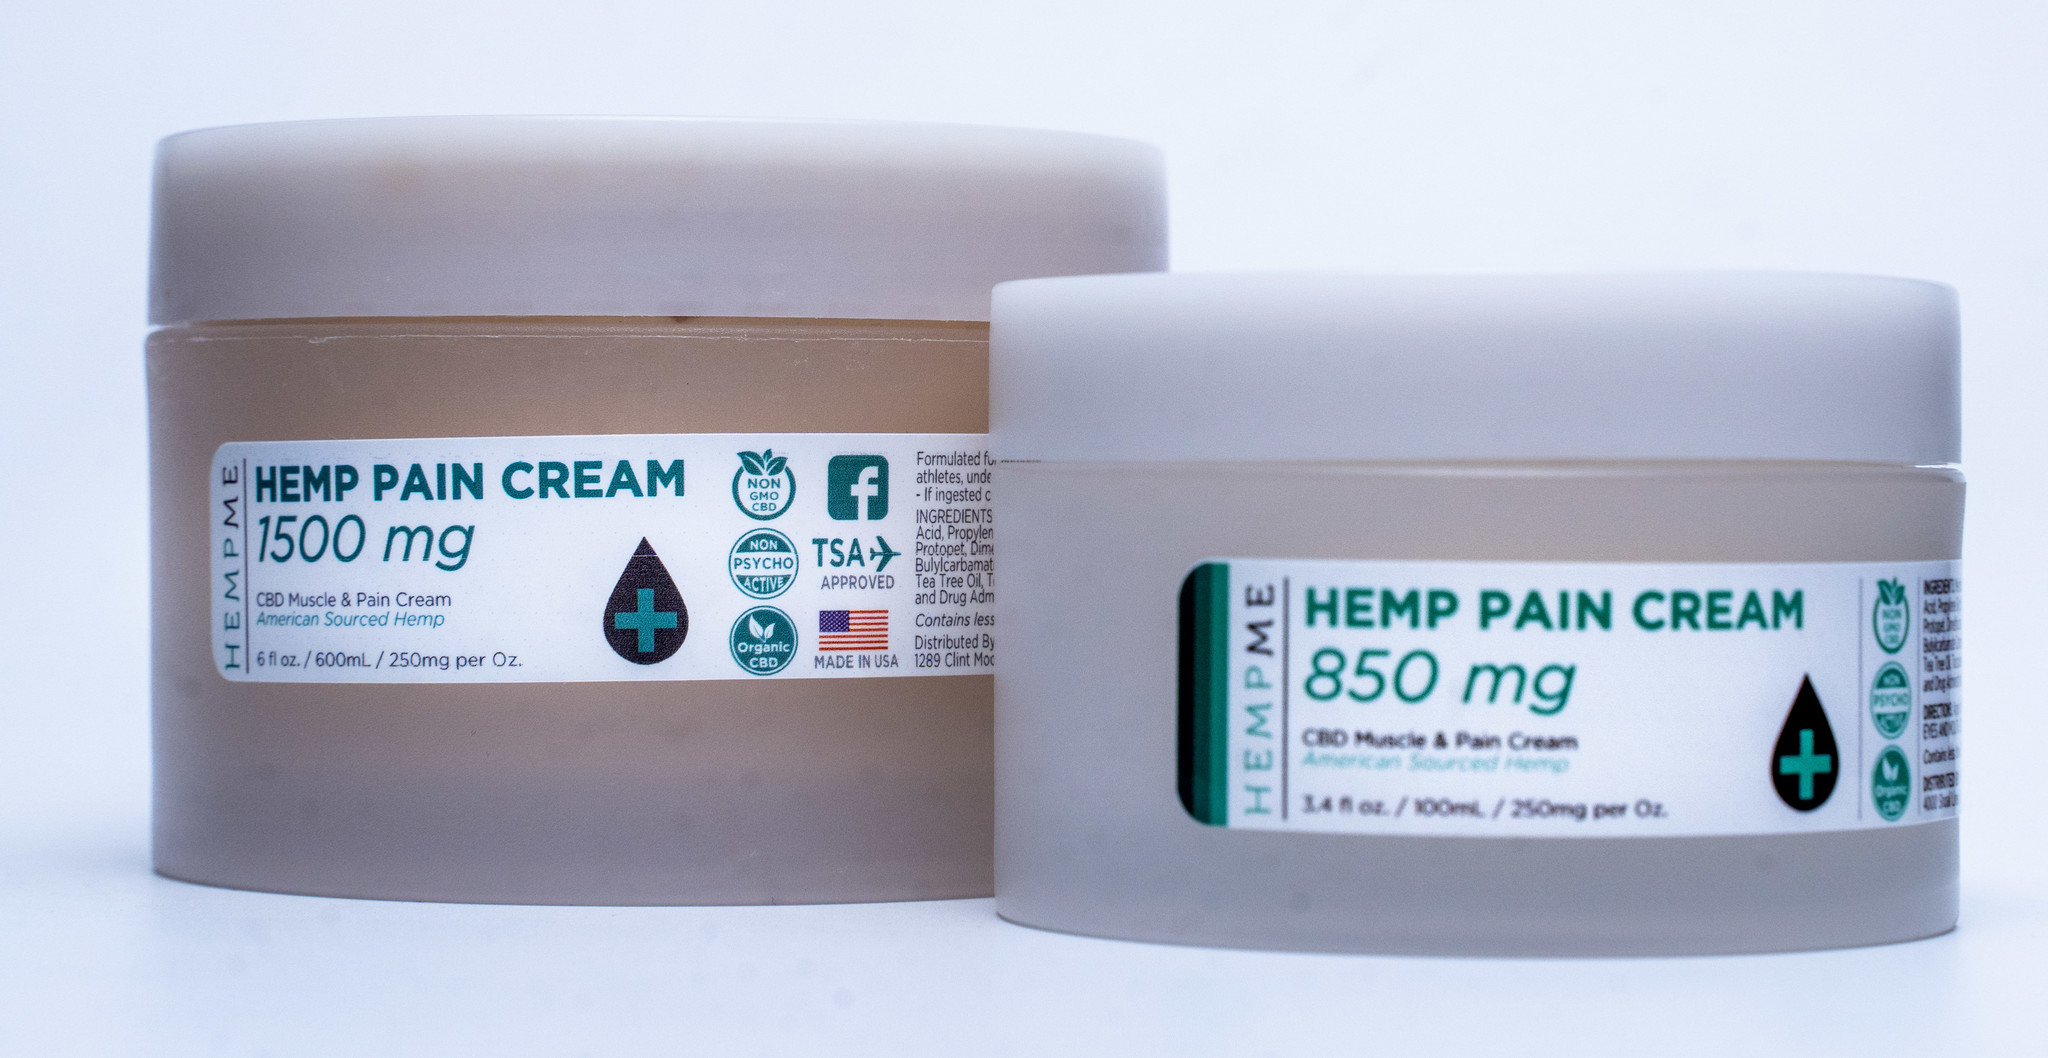 HempMe   HempME   CBD PAIN & REPAIR CREAM   850mg to 1500mg  